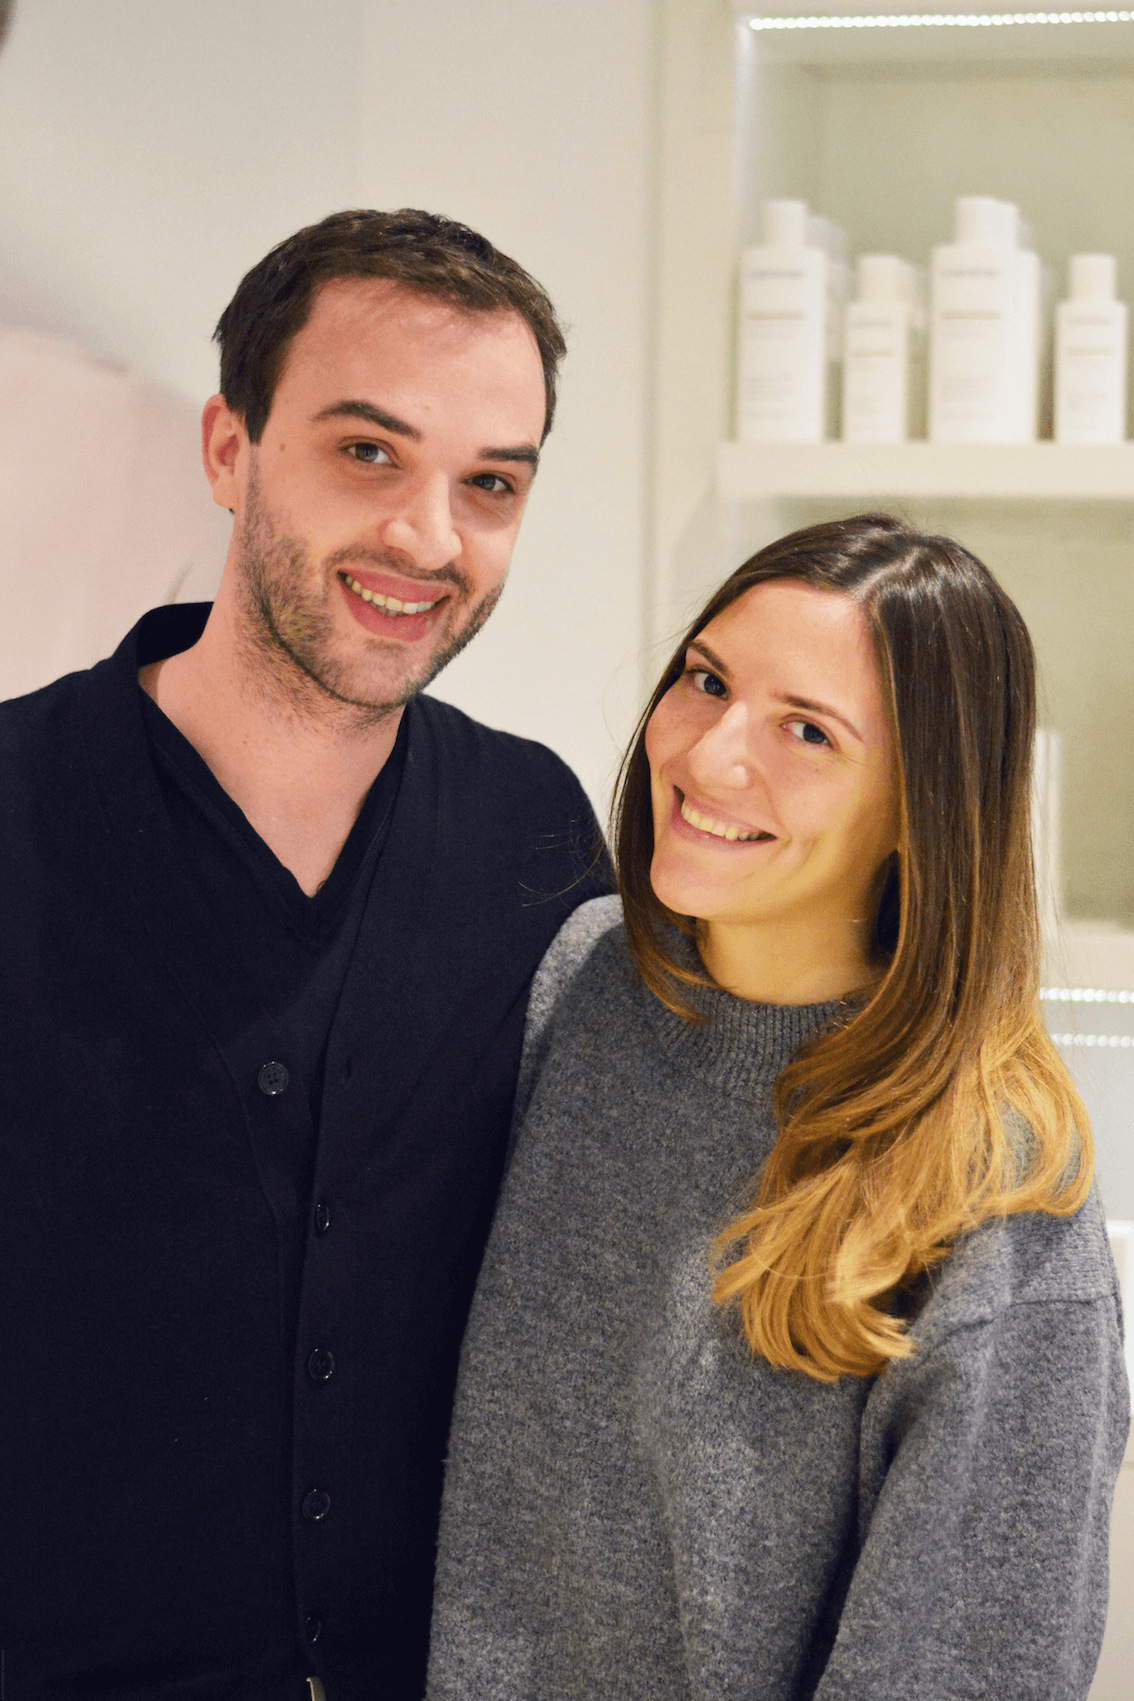 salon de coiffure paris 16